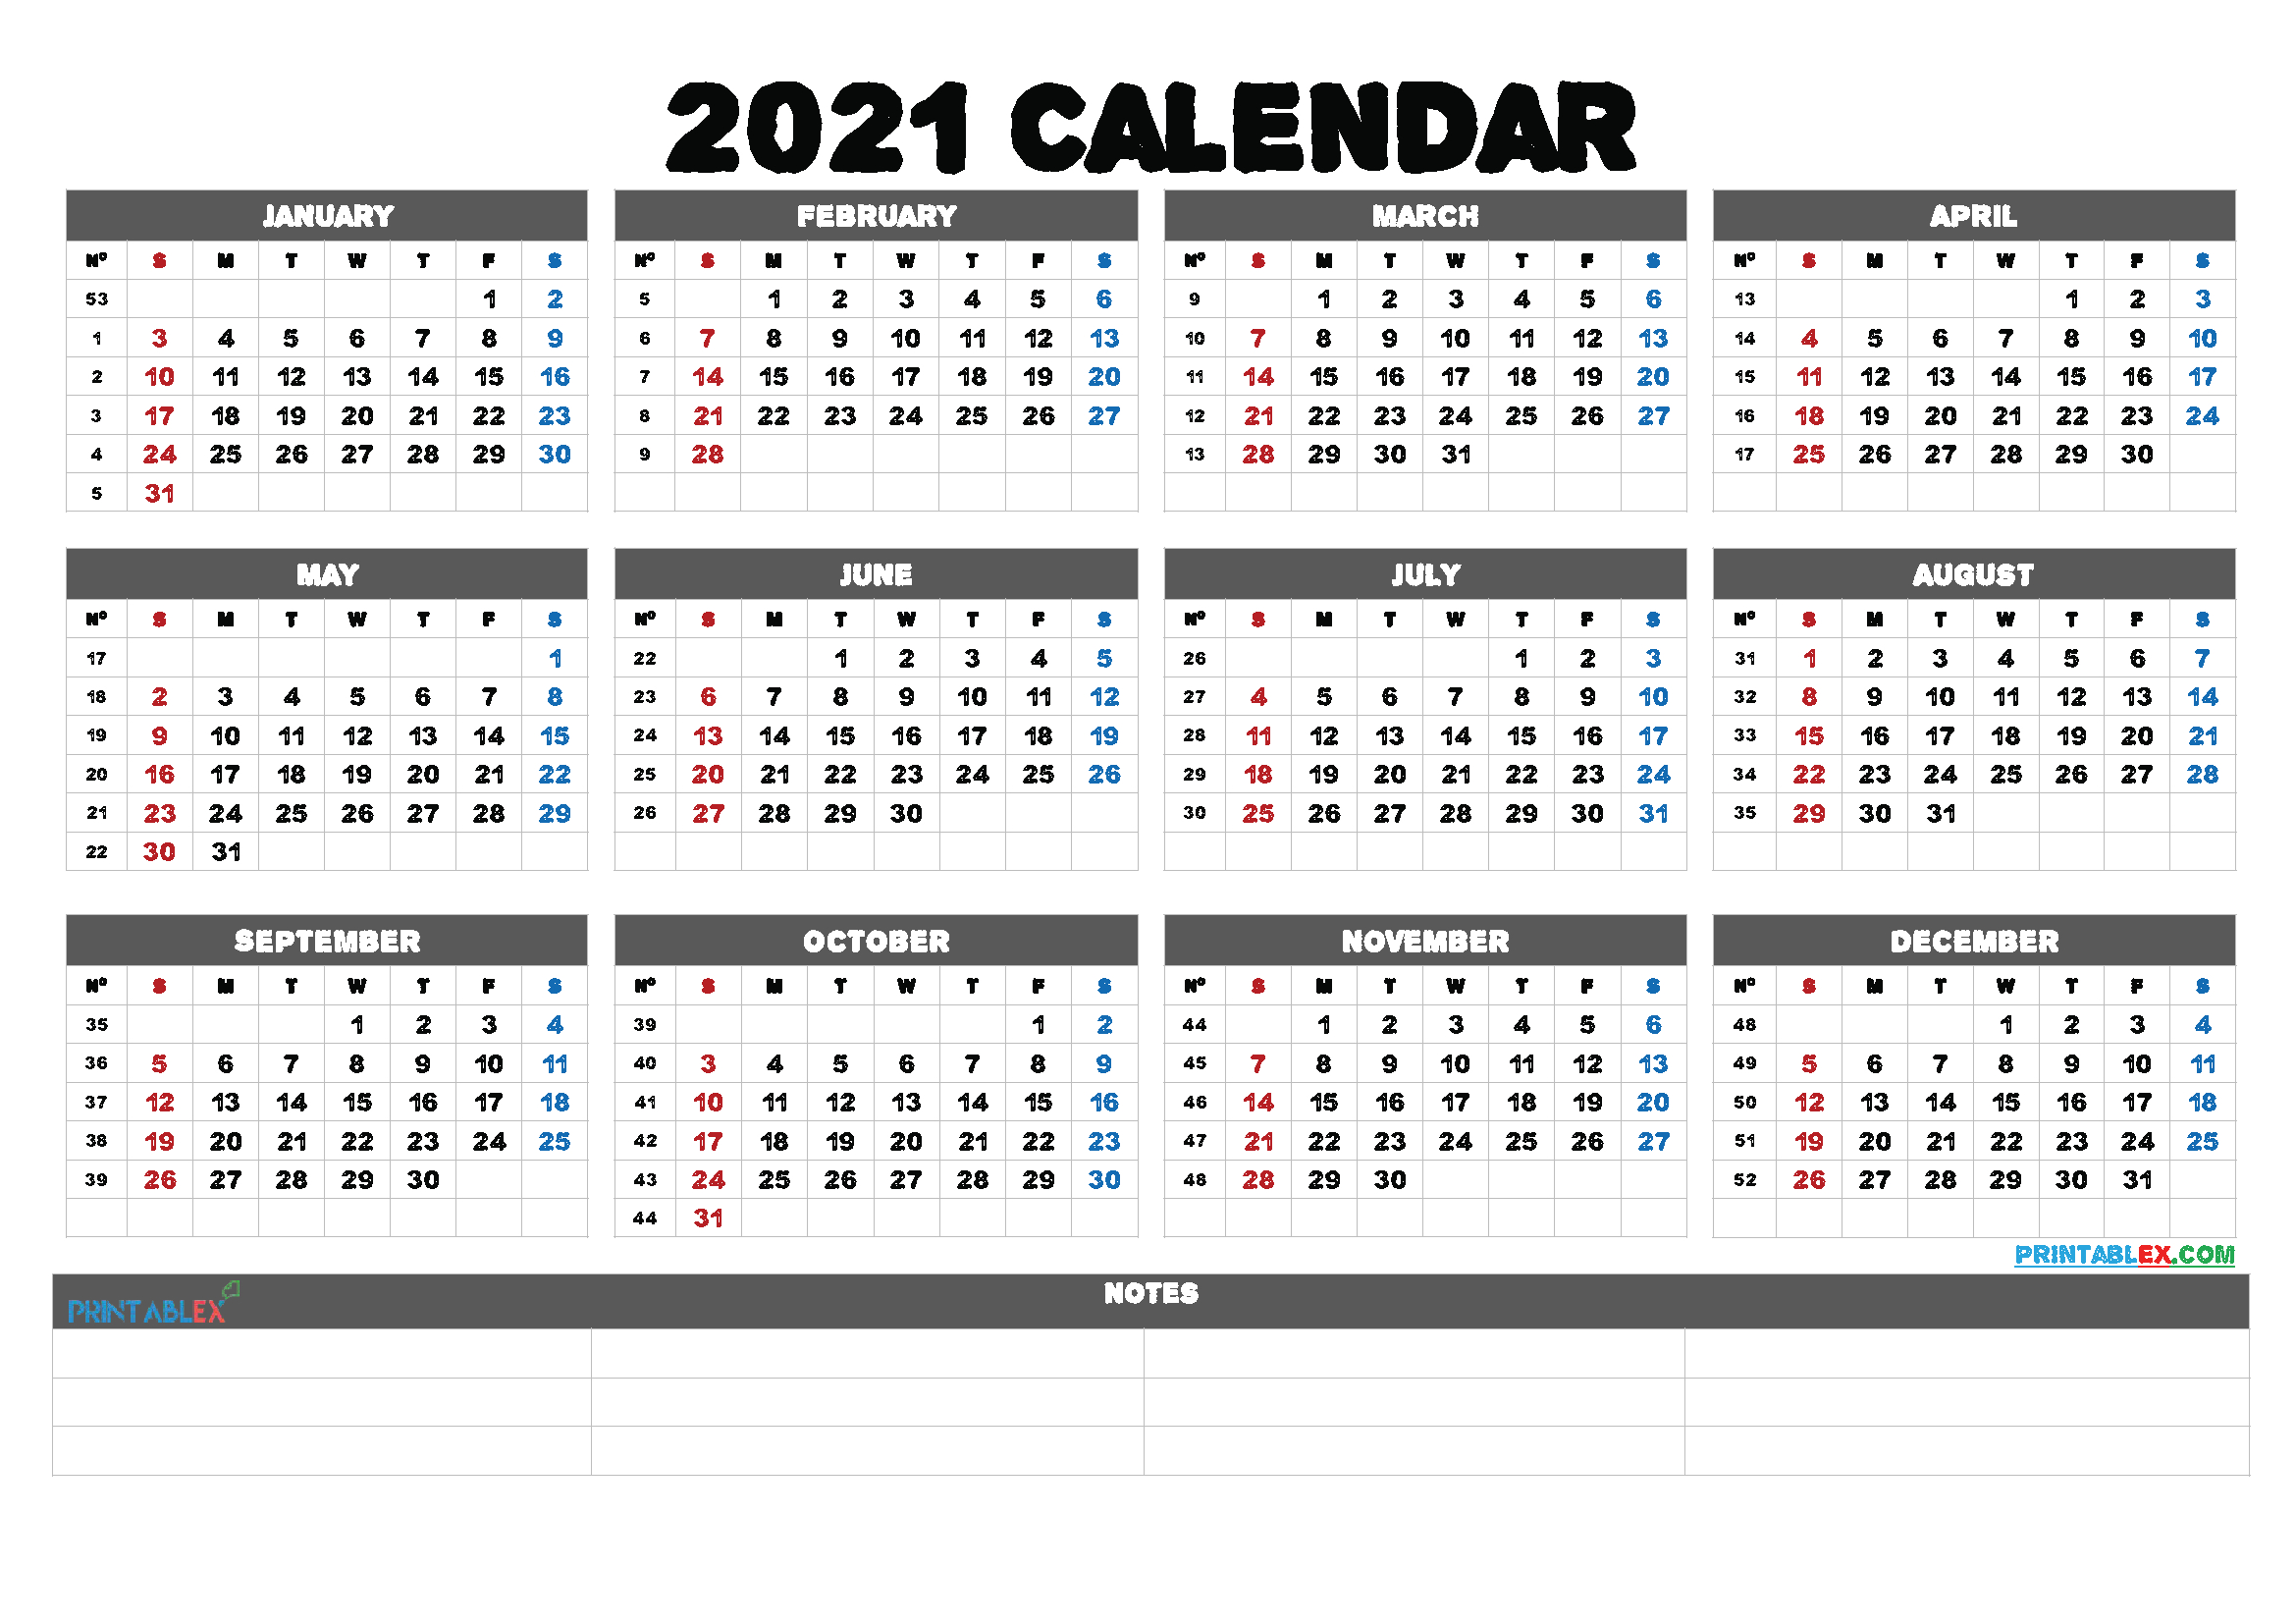 Printable 5 By 8 2021 Calendar - 8 5 X 11 Inch Bold 2021